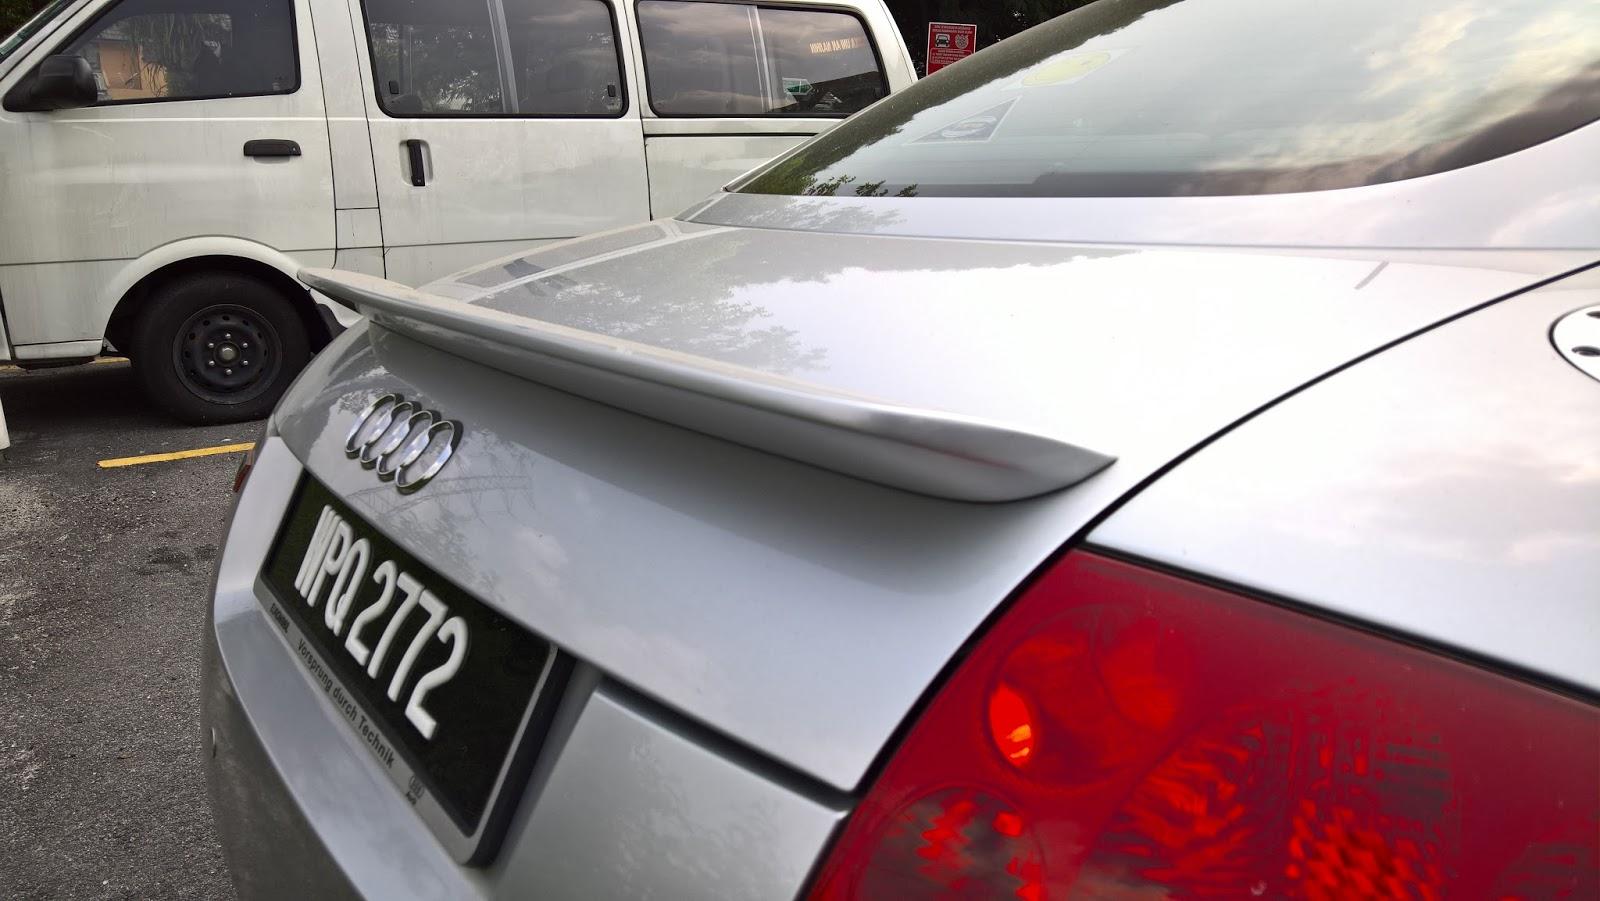 Throwback Thursday Drive: 2006 Audi TT Mk1 (Type 8N, non